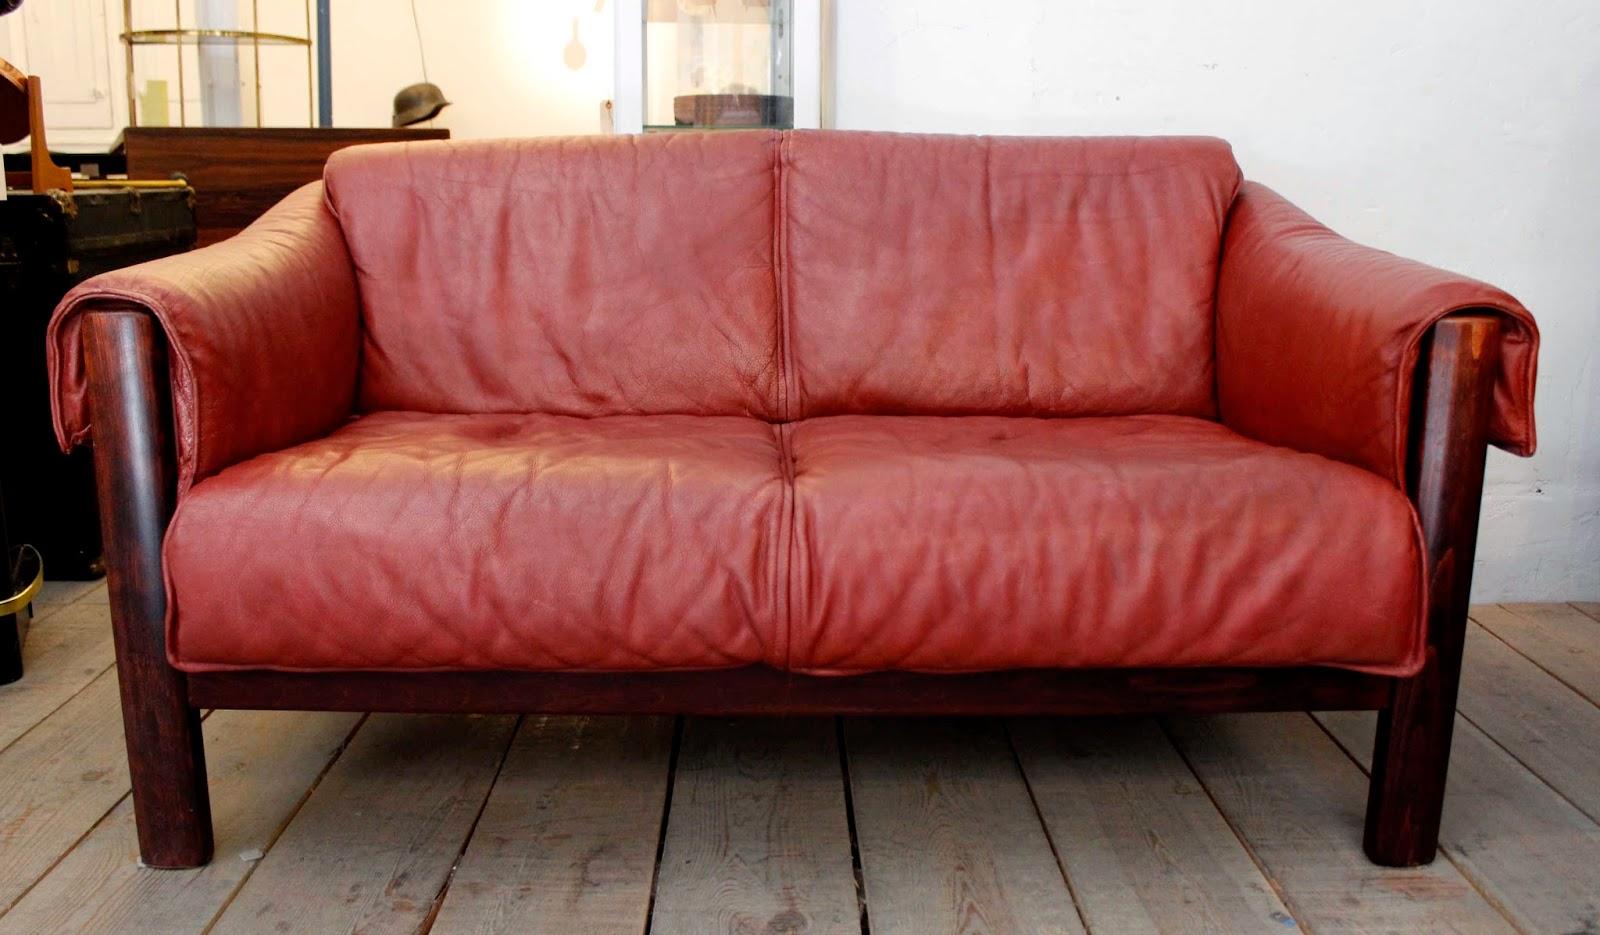 sofas rinconeras baratos madrid segunda mano rv sofa recliners